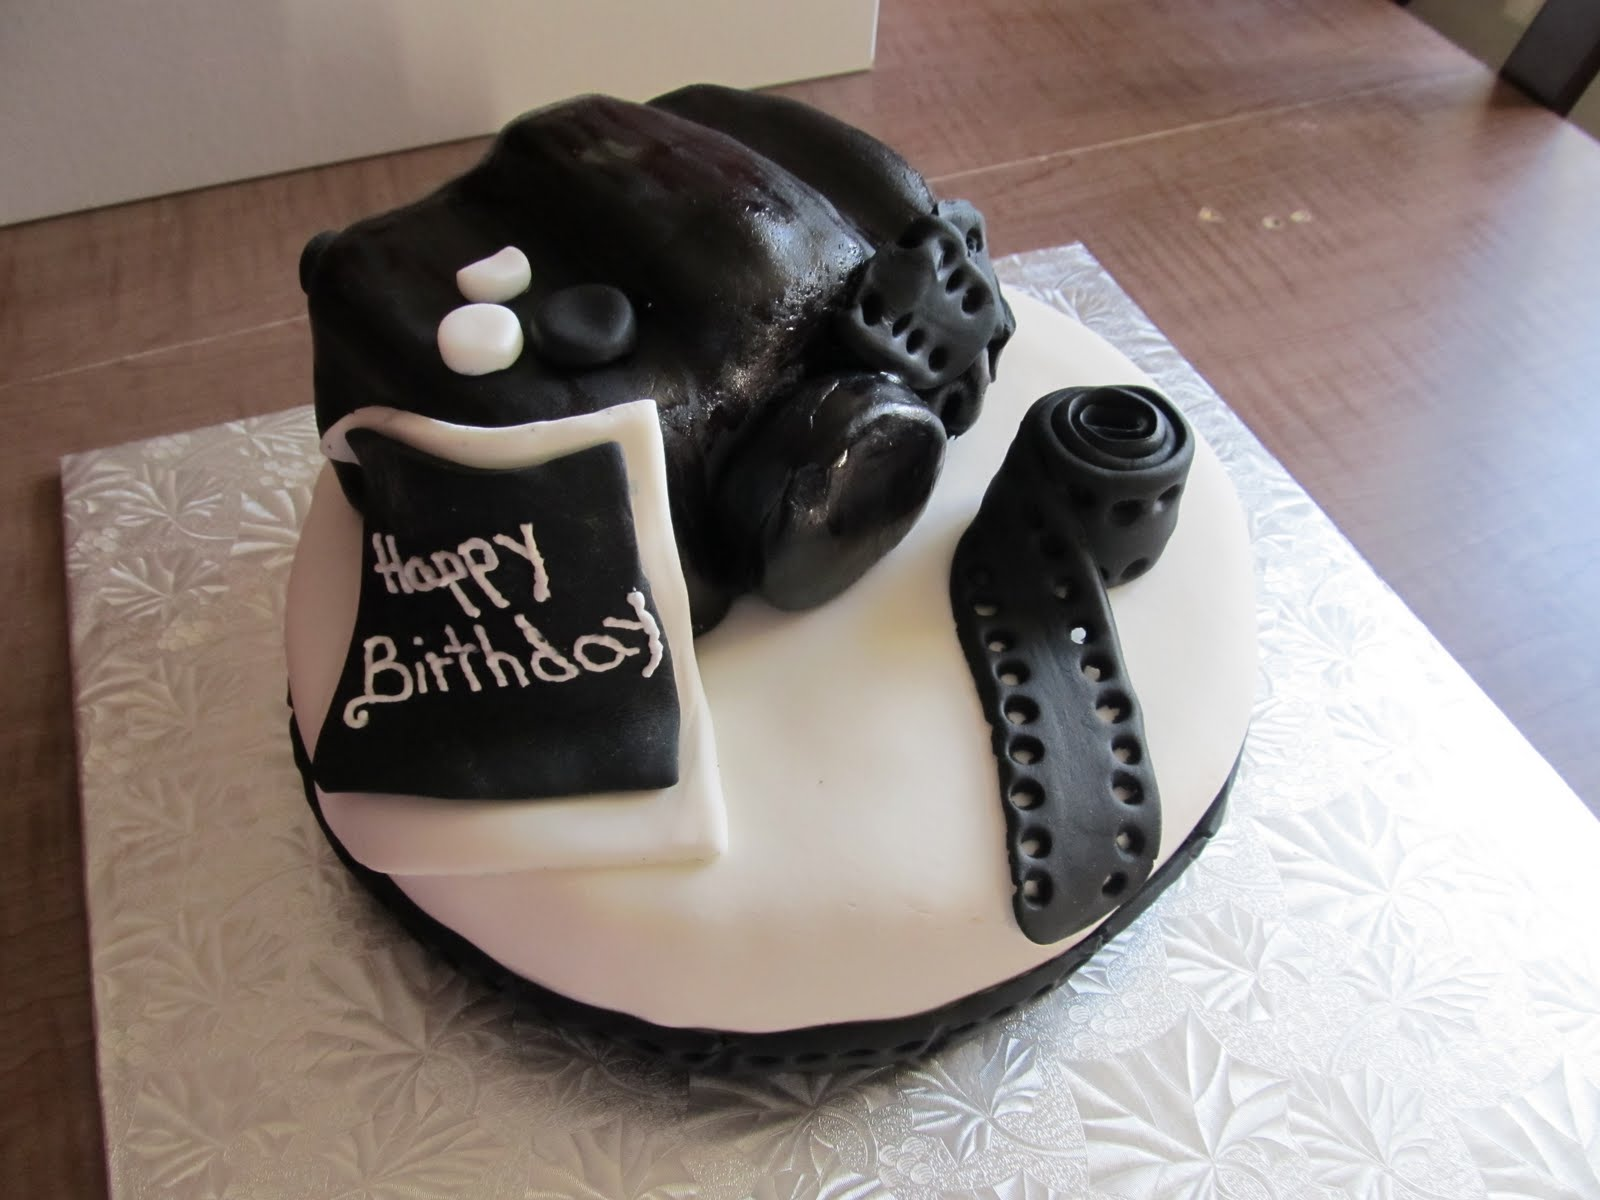 3D Camera Cake!